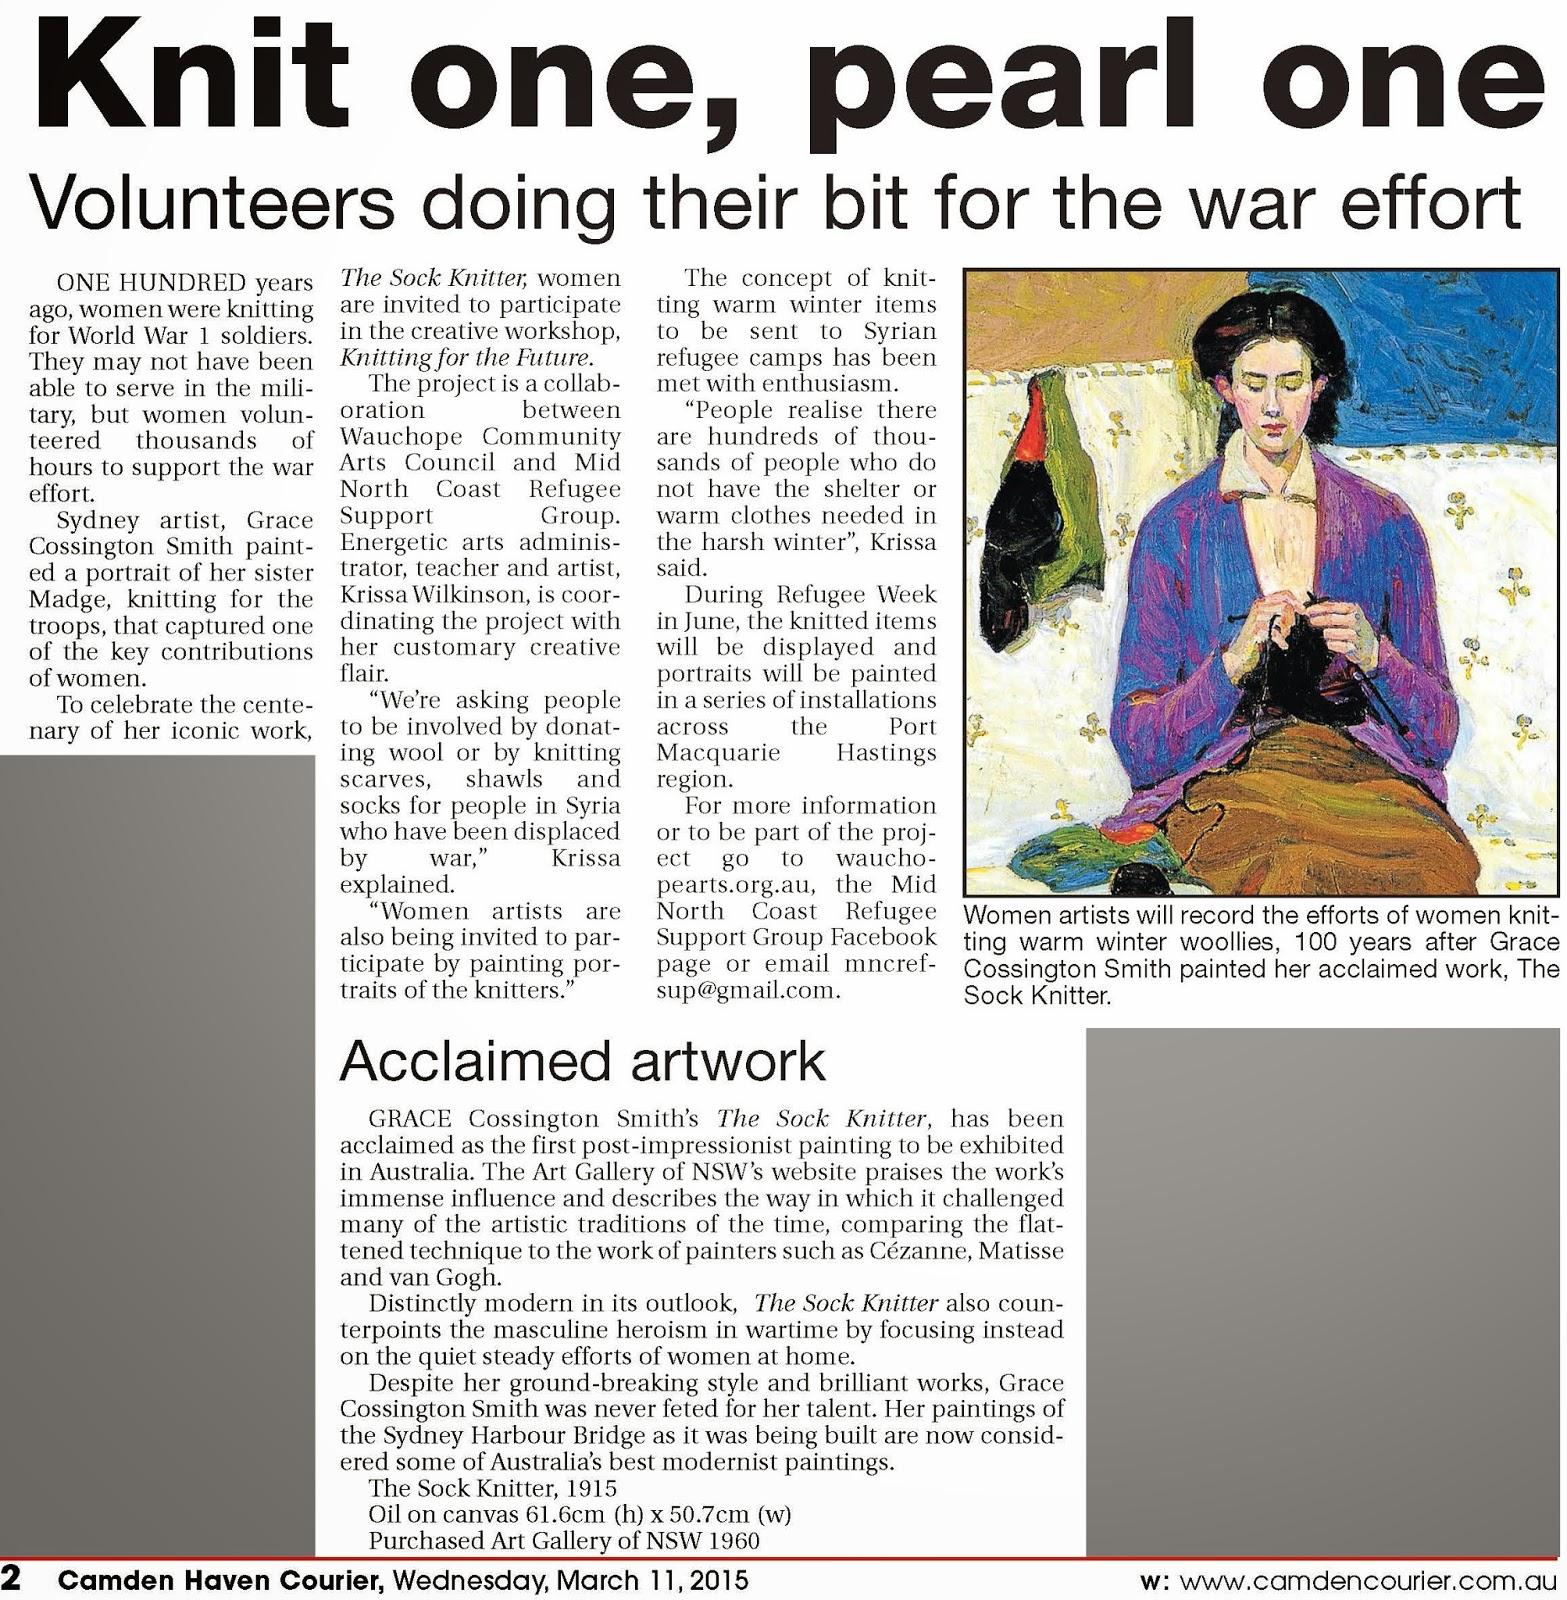 http://www.camdencourier.com.au/story/2940164/knit-one-purl-one/?cs=706